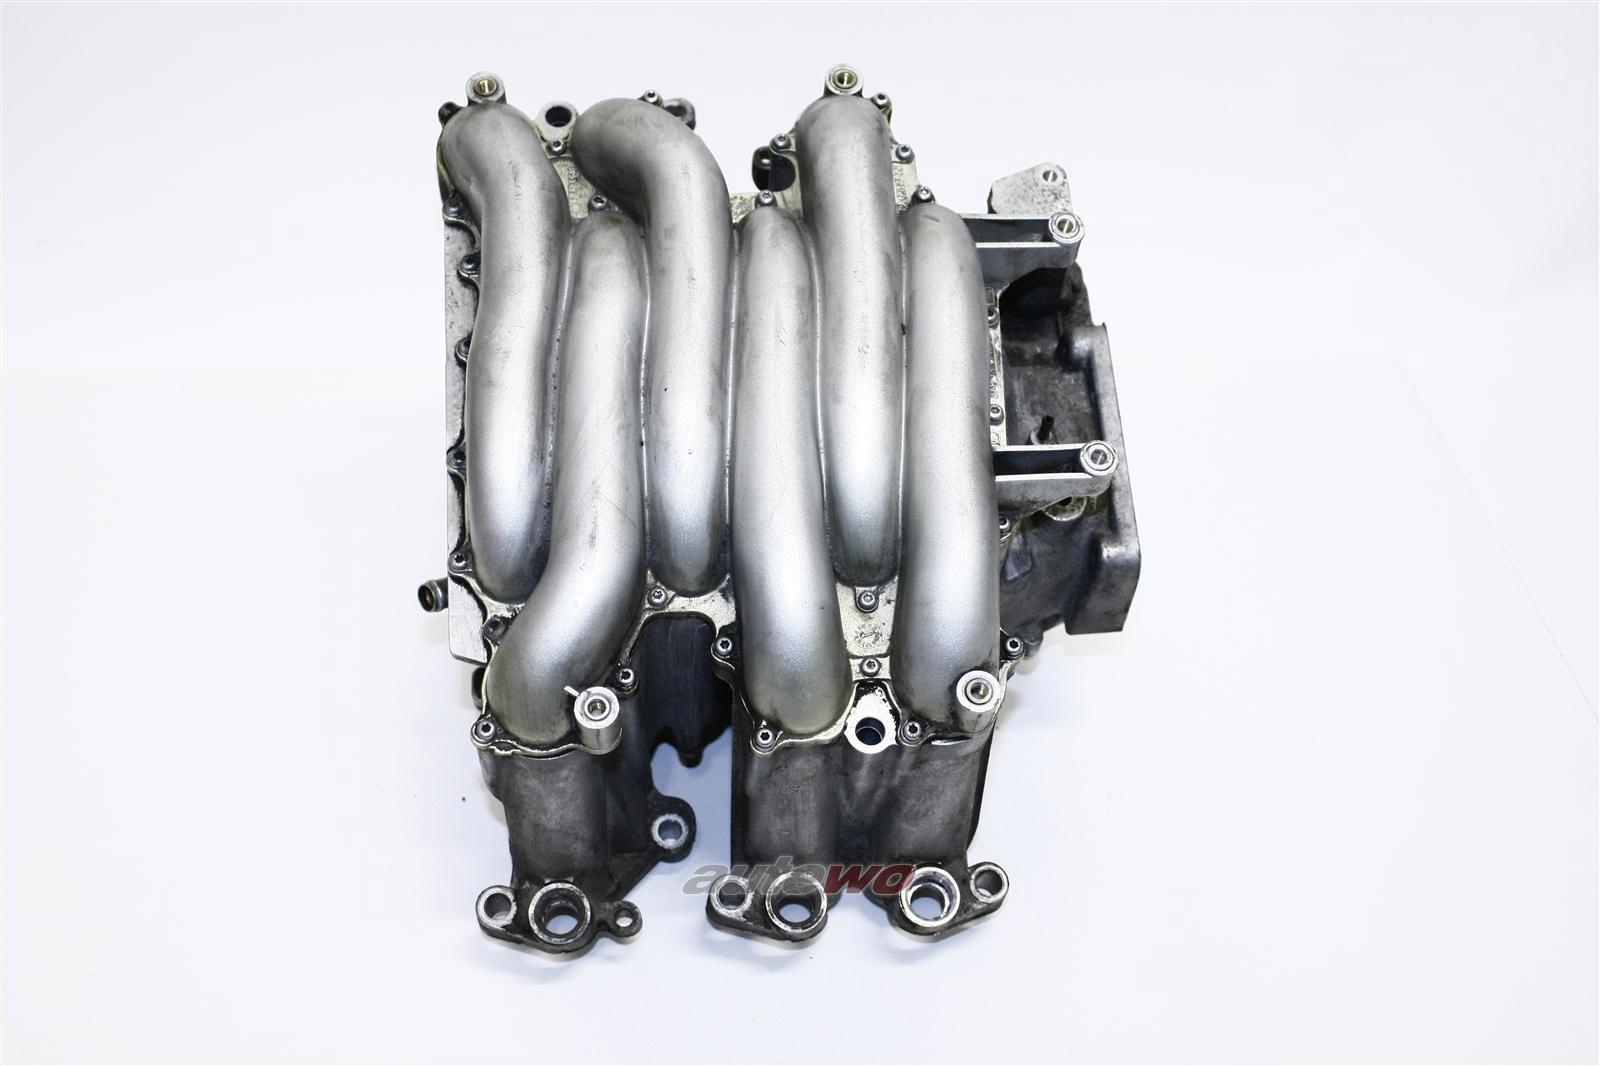 Audi 80 B4/A4/A6 2.6l 150PS ABC Saugrohr Schaltgetriebe 078133201E